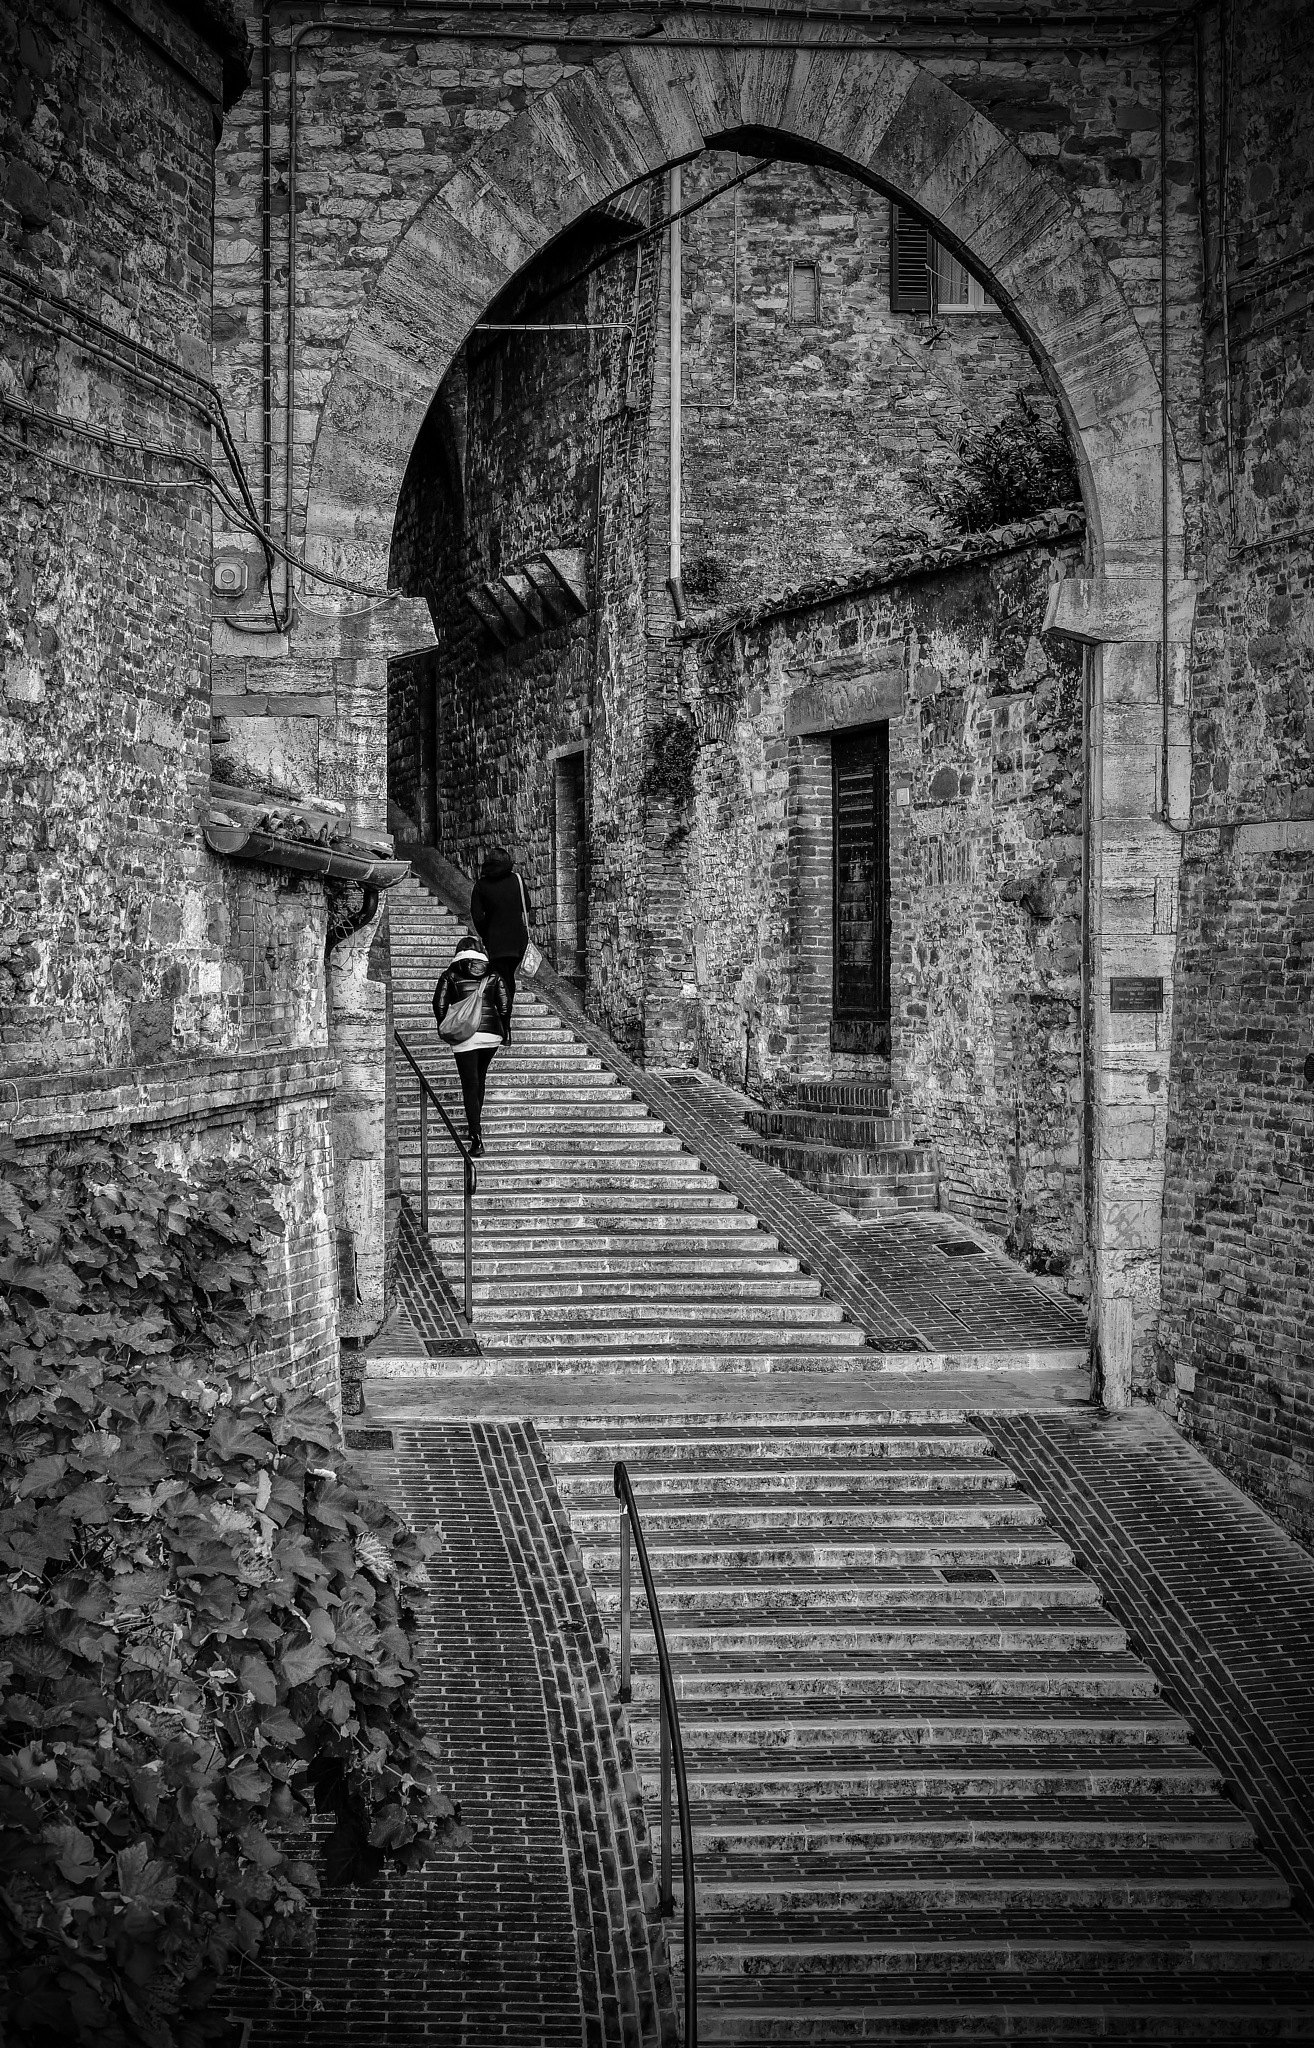 On street Perugia by Luca Loppi